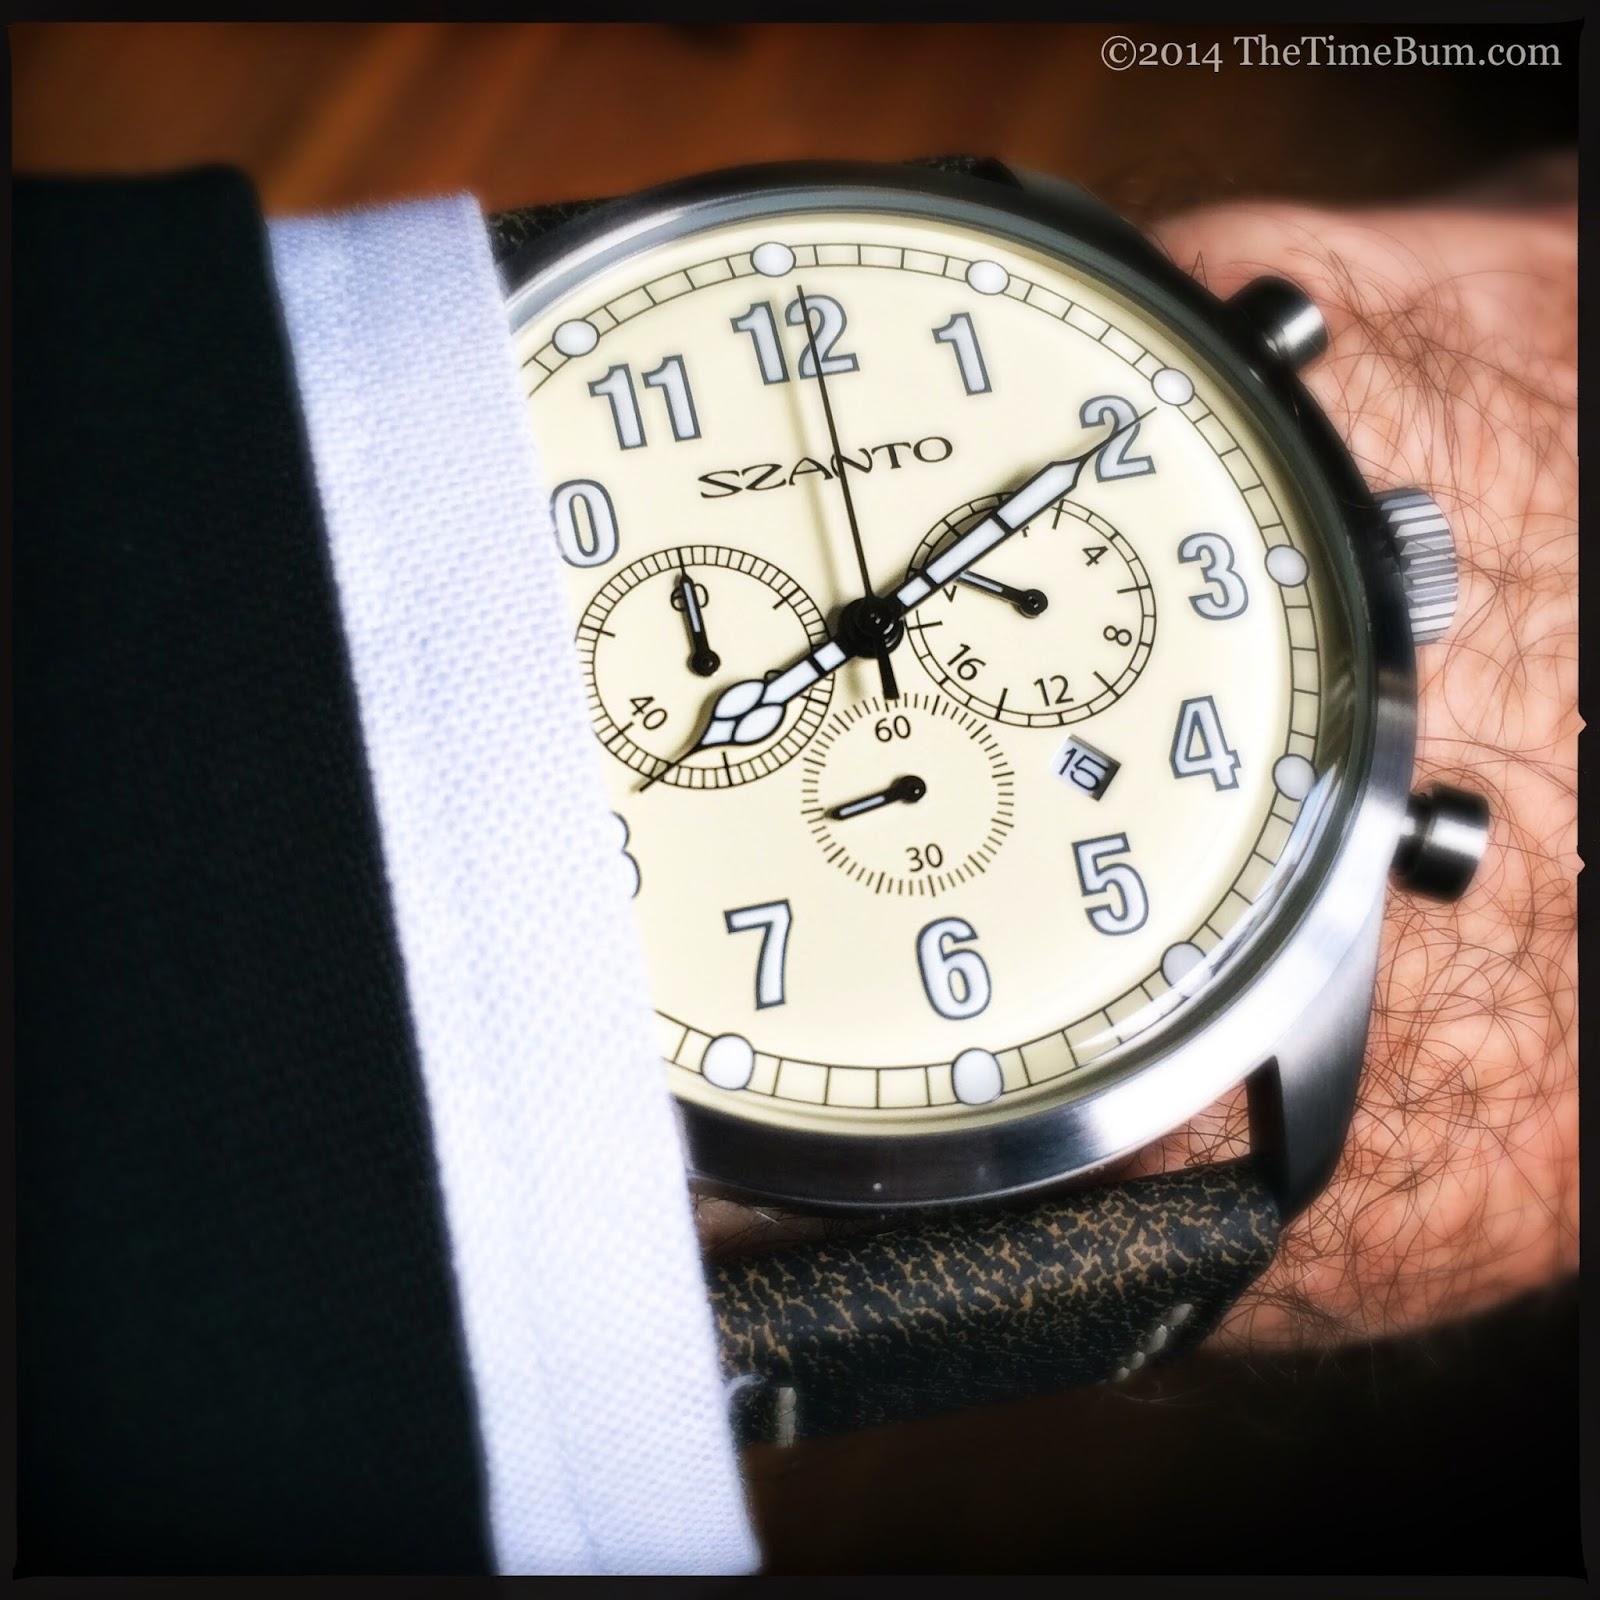 Szanto 2002 Chronograph